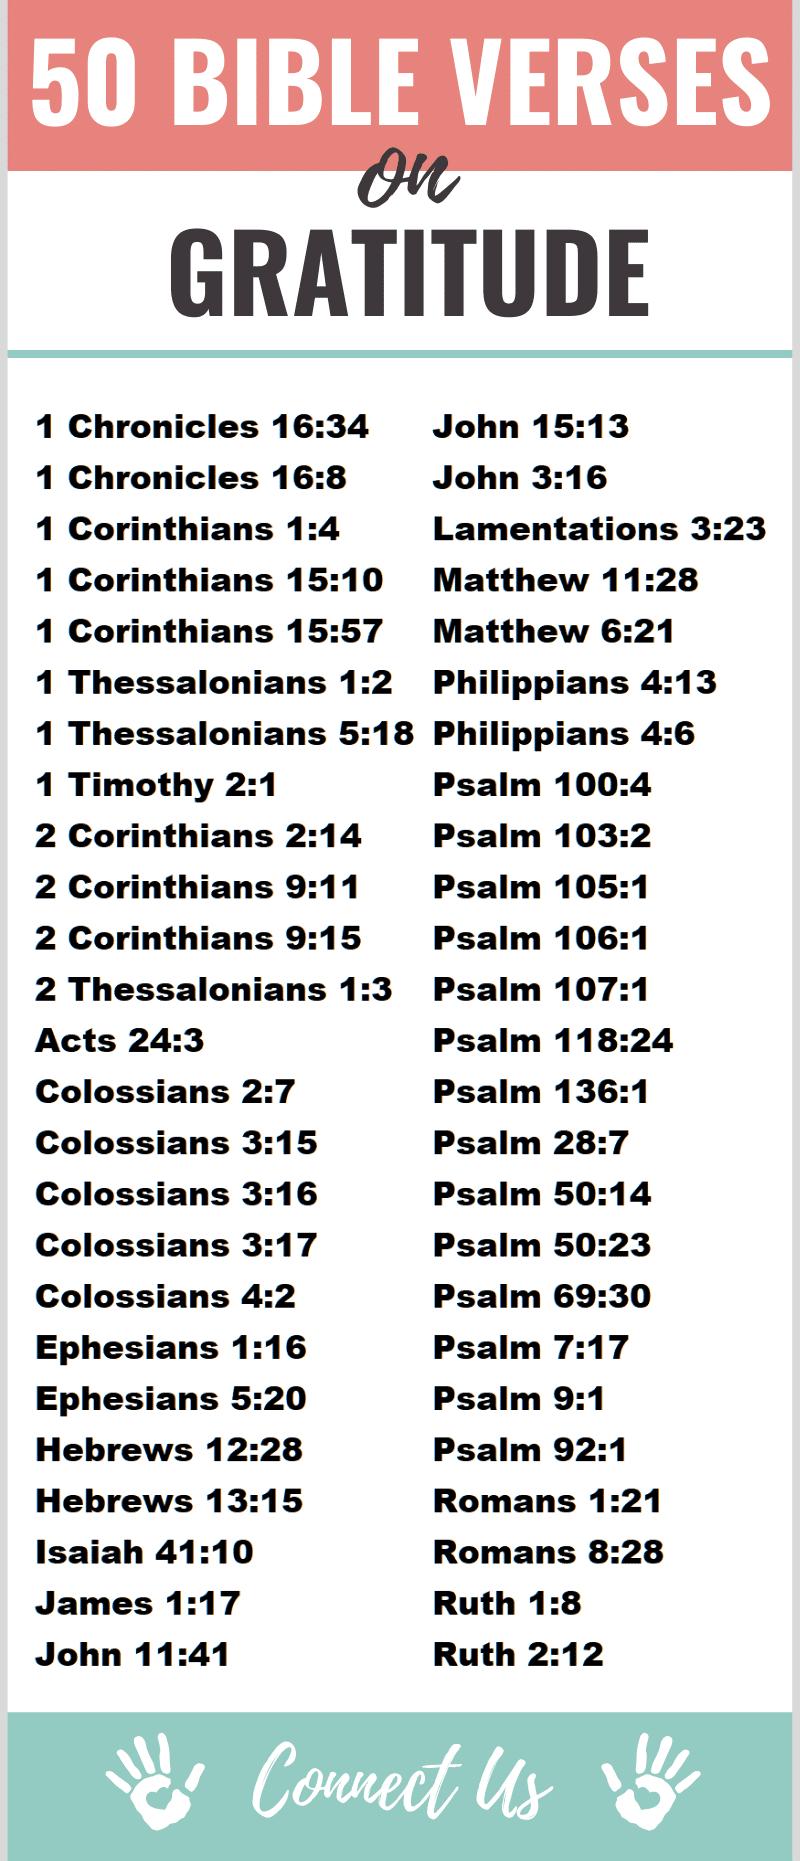 Bible Verses on Gratitude